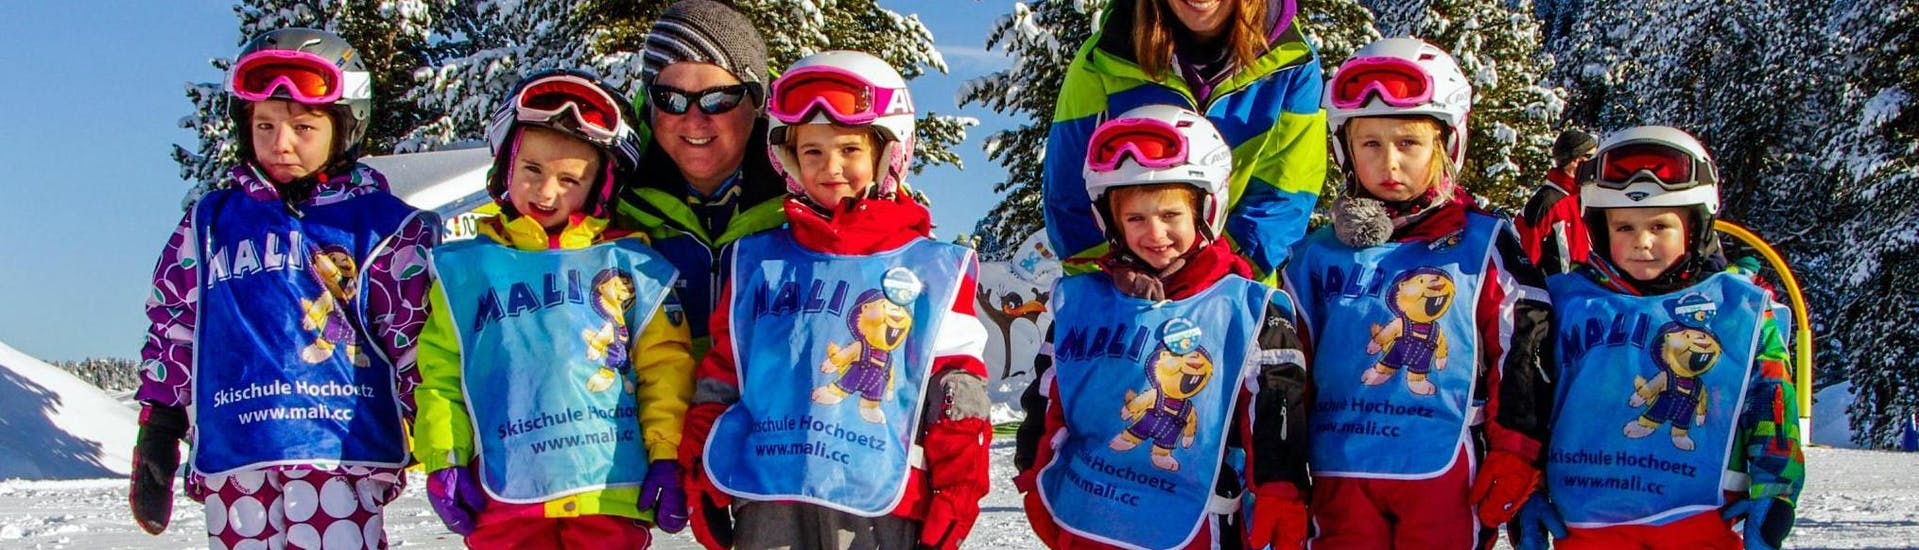 Kids Ski Lessons (from 3 y.) for All Levels avec Skischool MALI / MALISPORT Oetz - Hero image